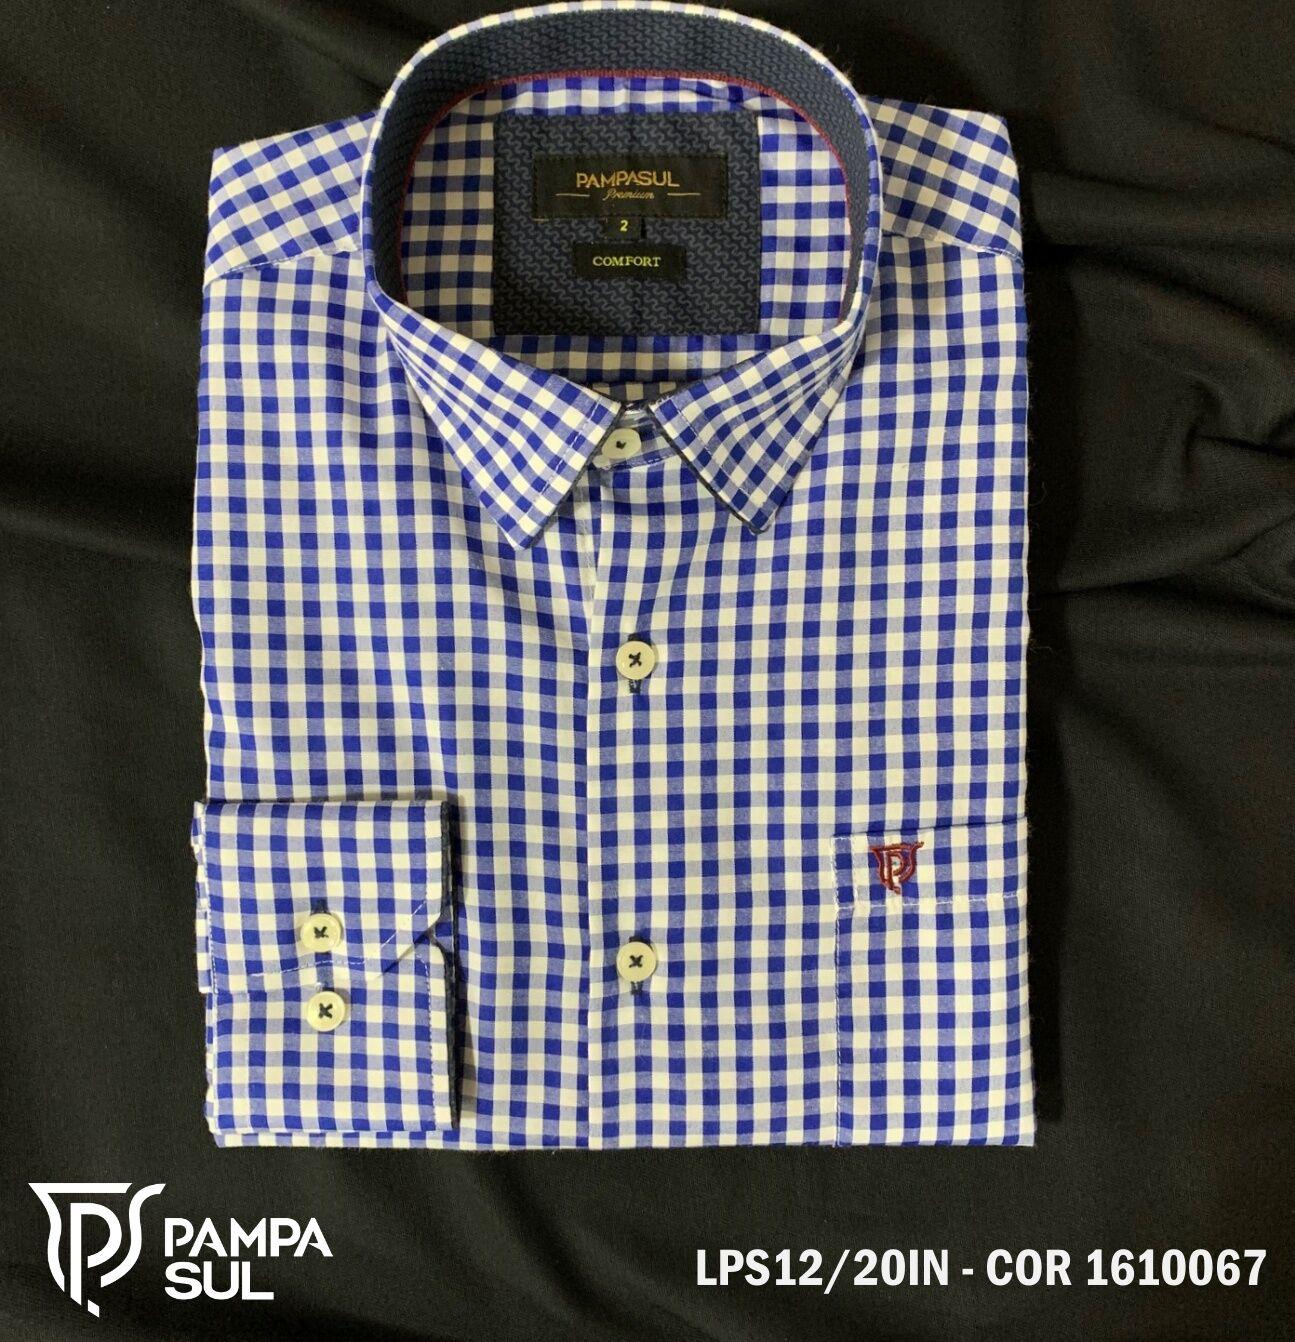 Camisa Pampa Sul Masculina Slim Confort LPS 12/20